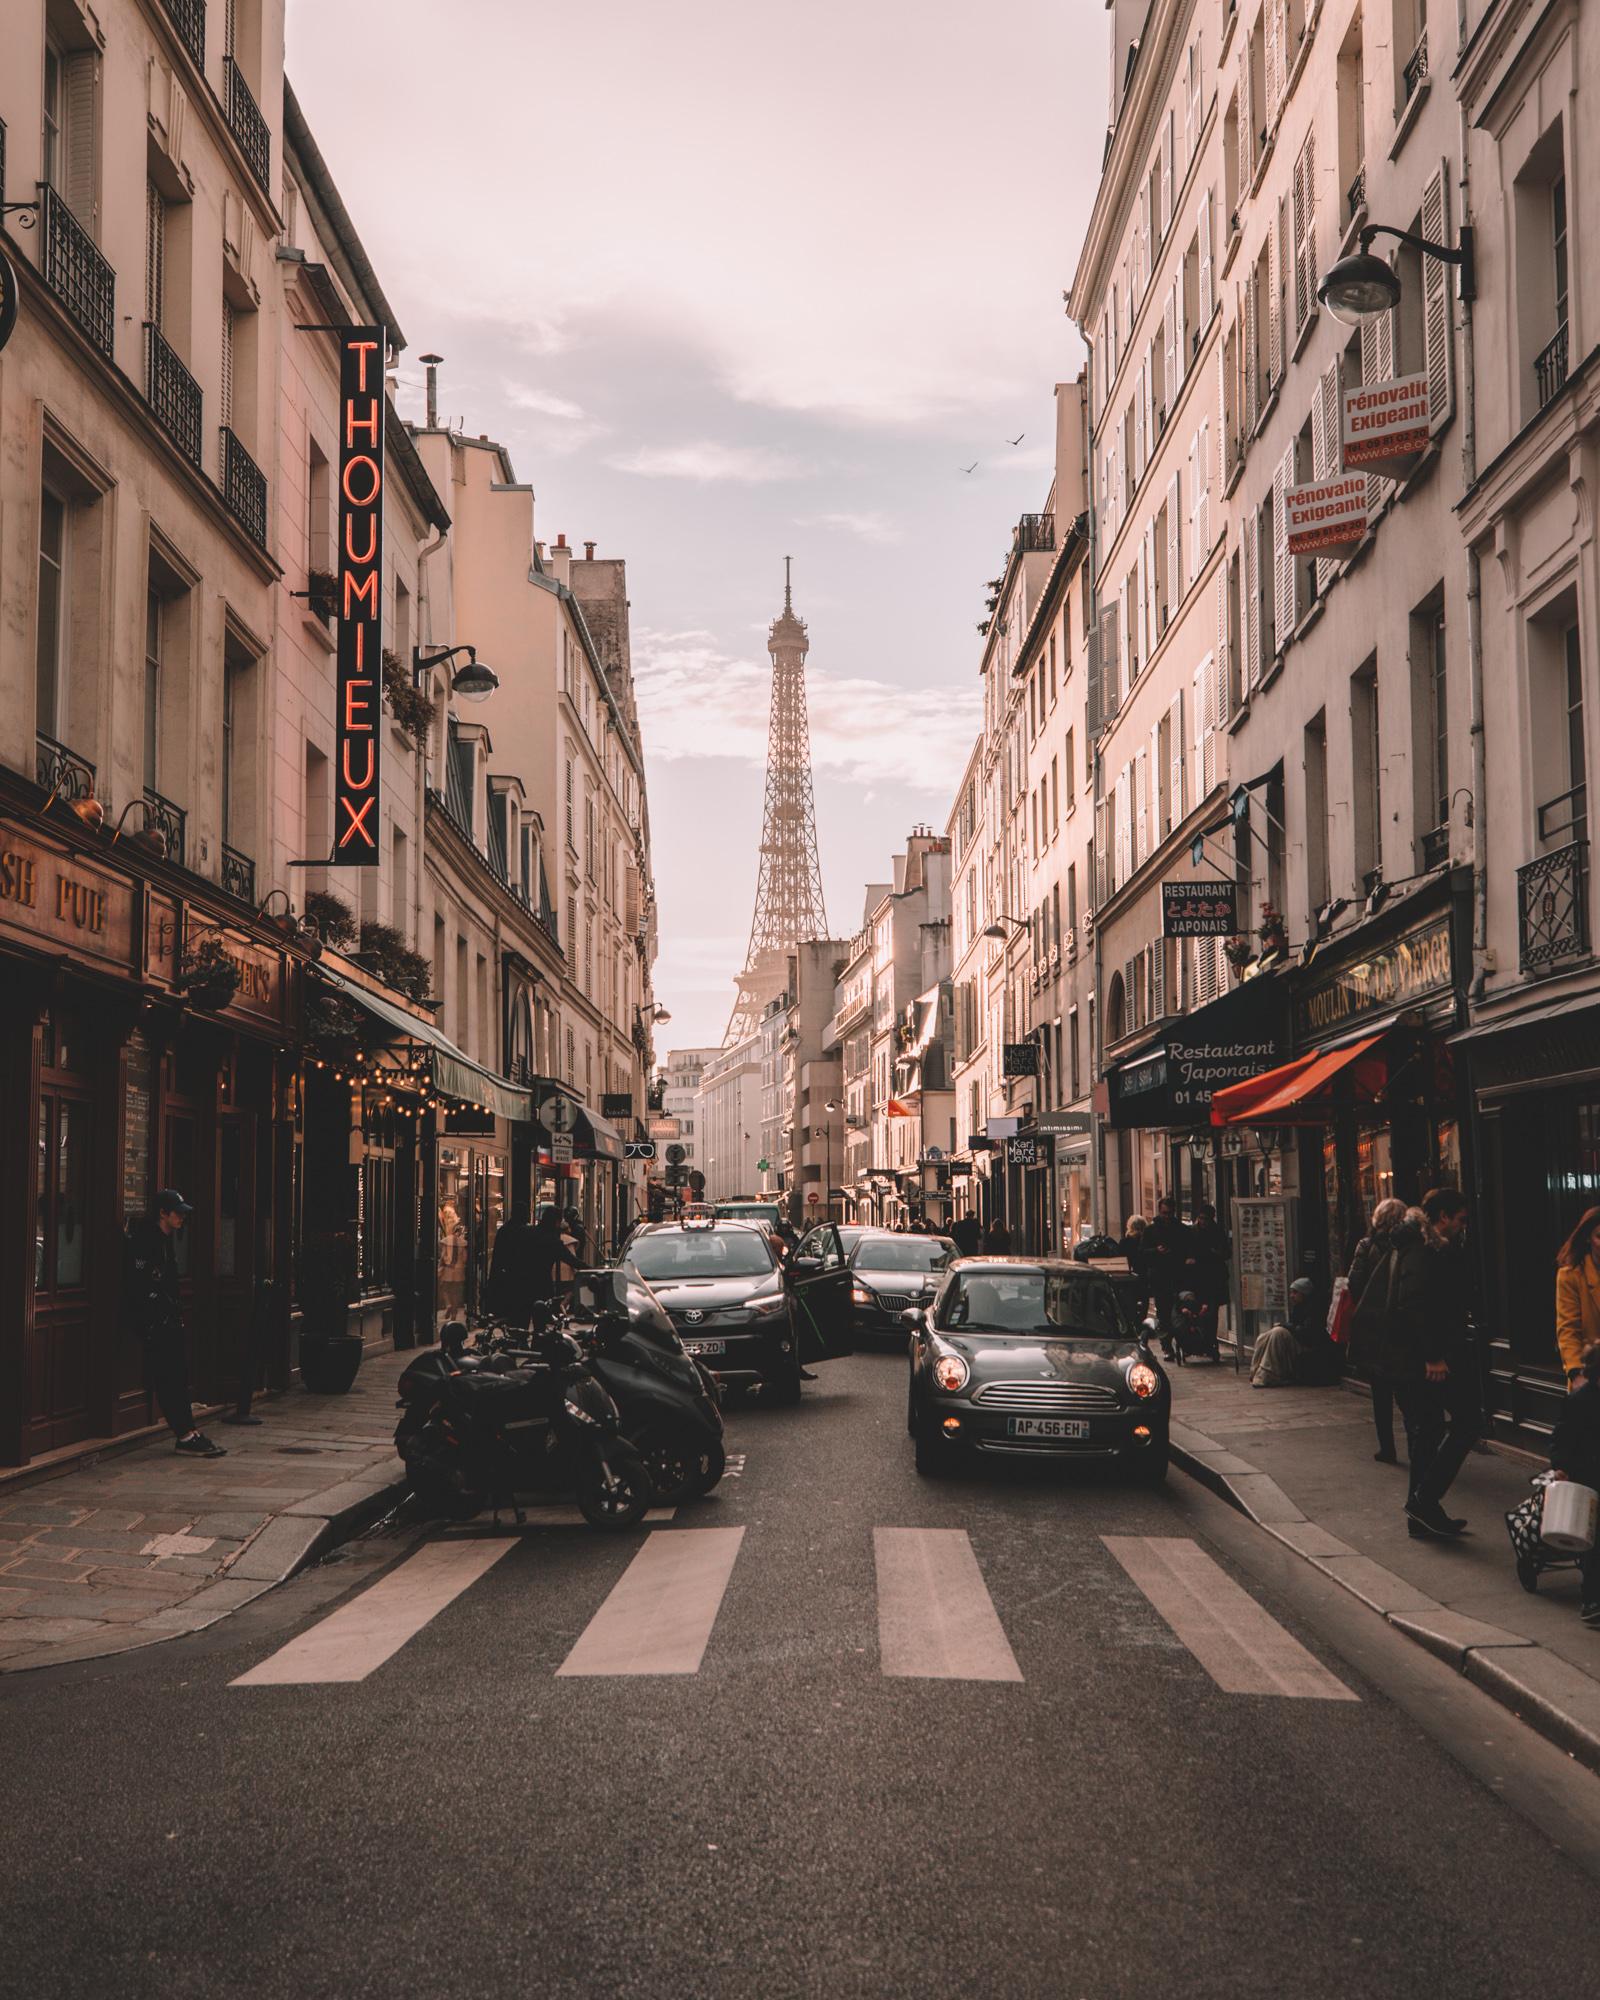 Paris - coming soon